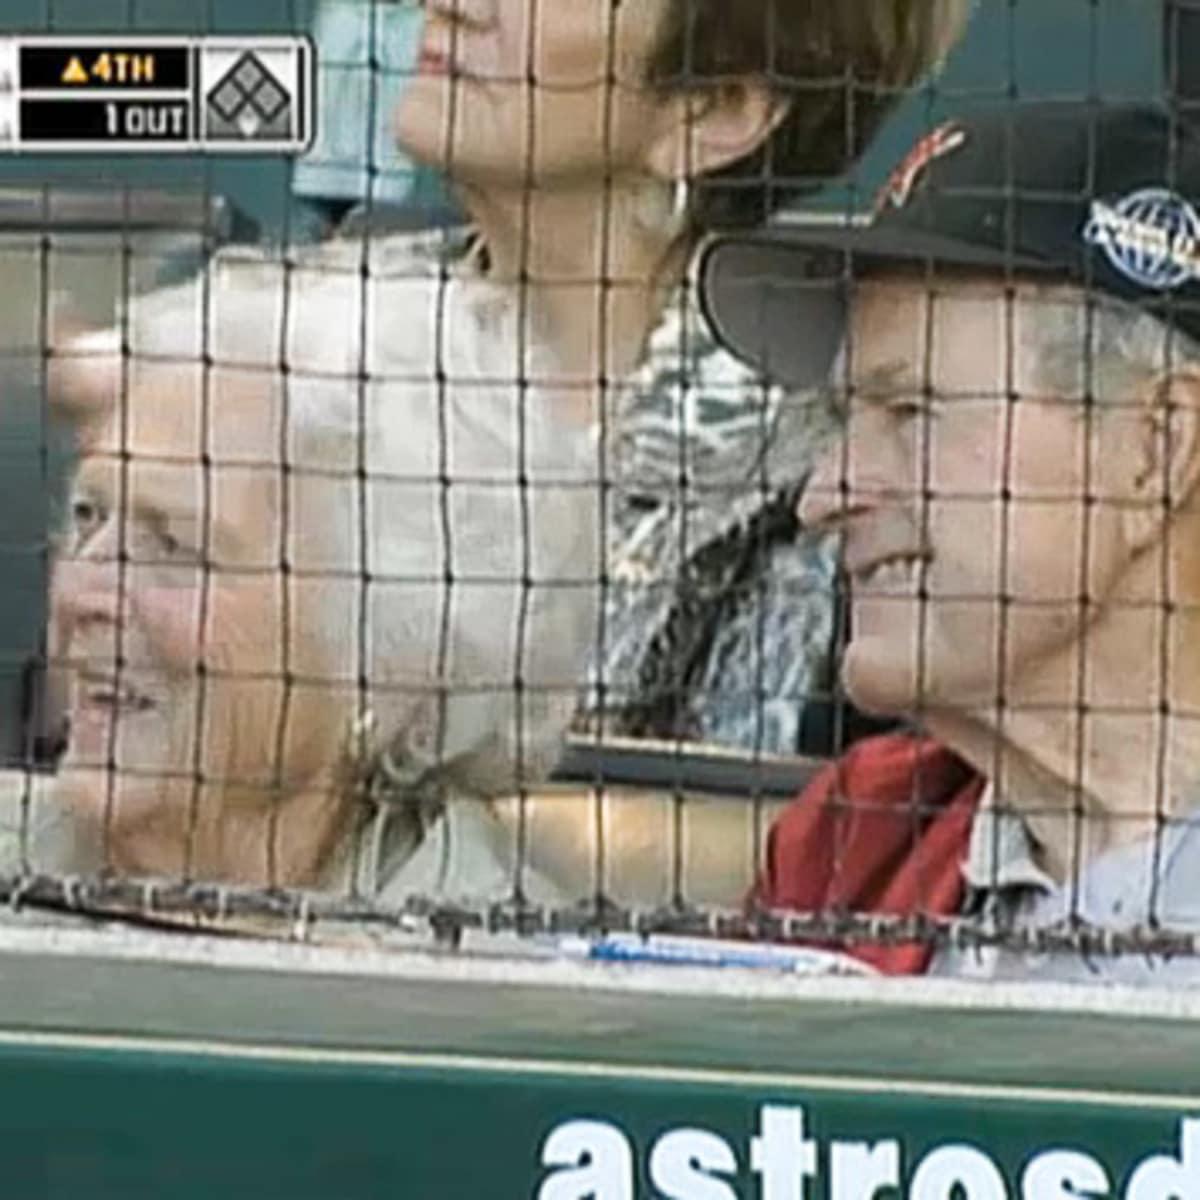 News_Opening day_Astros_Barbara Bush_George Bush